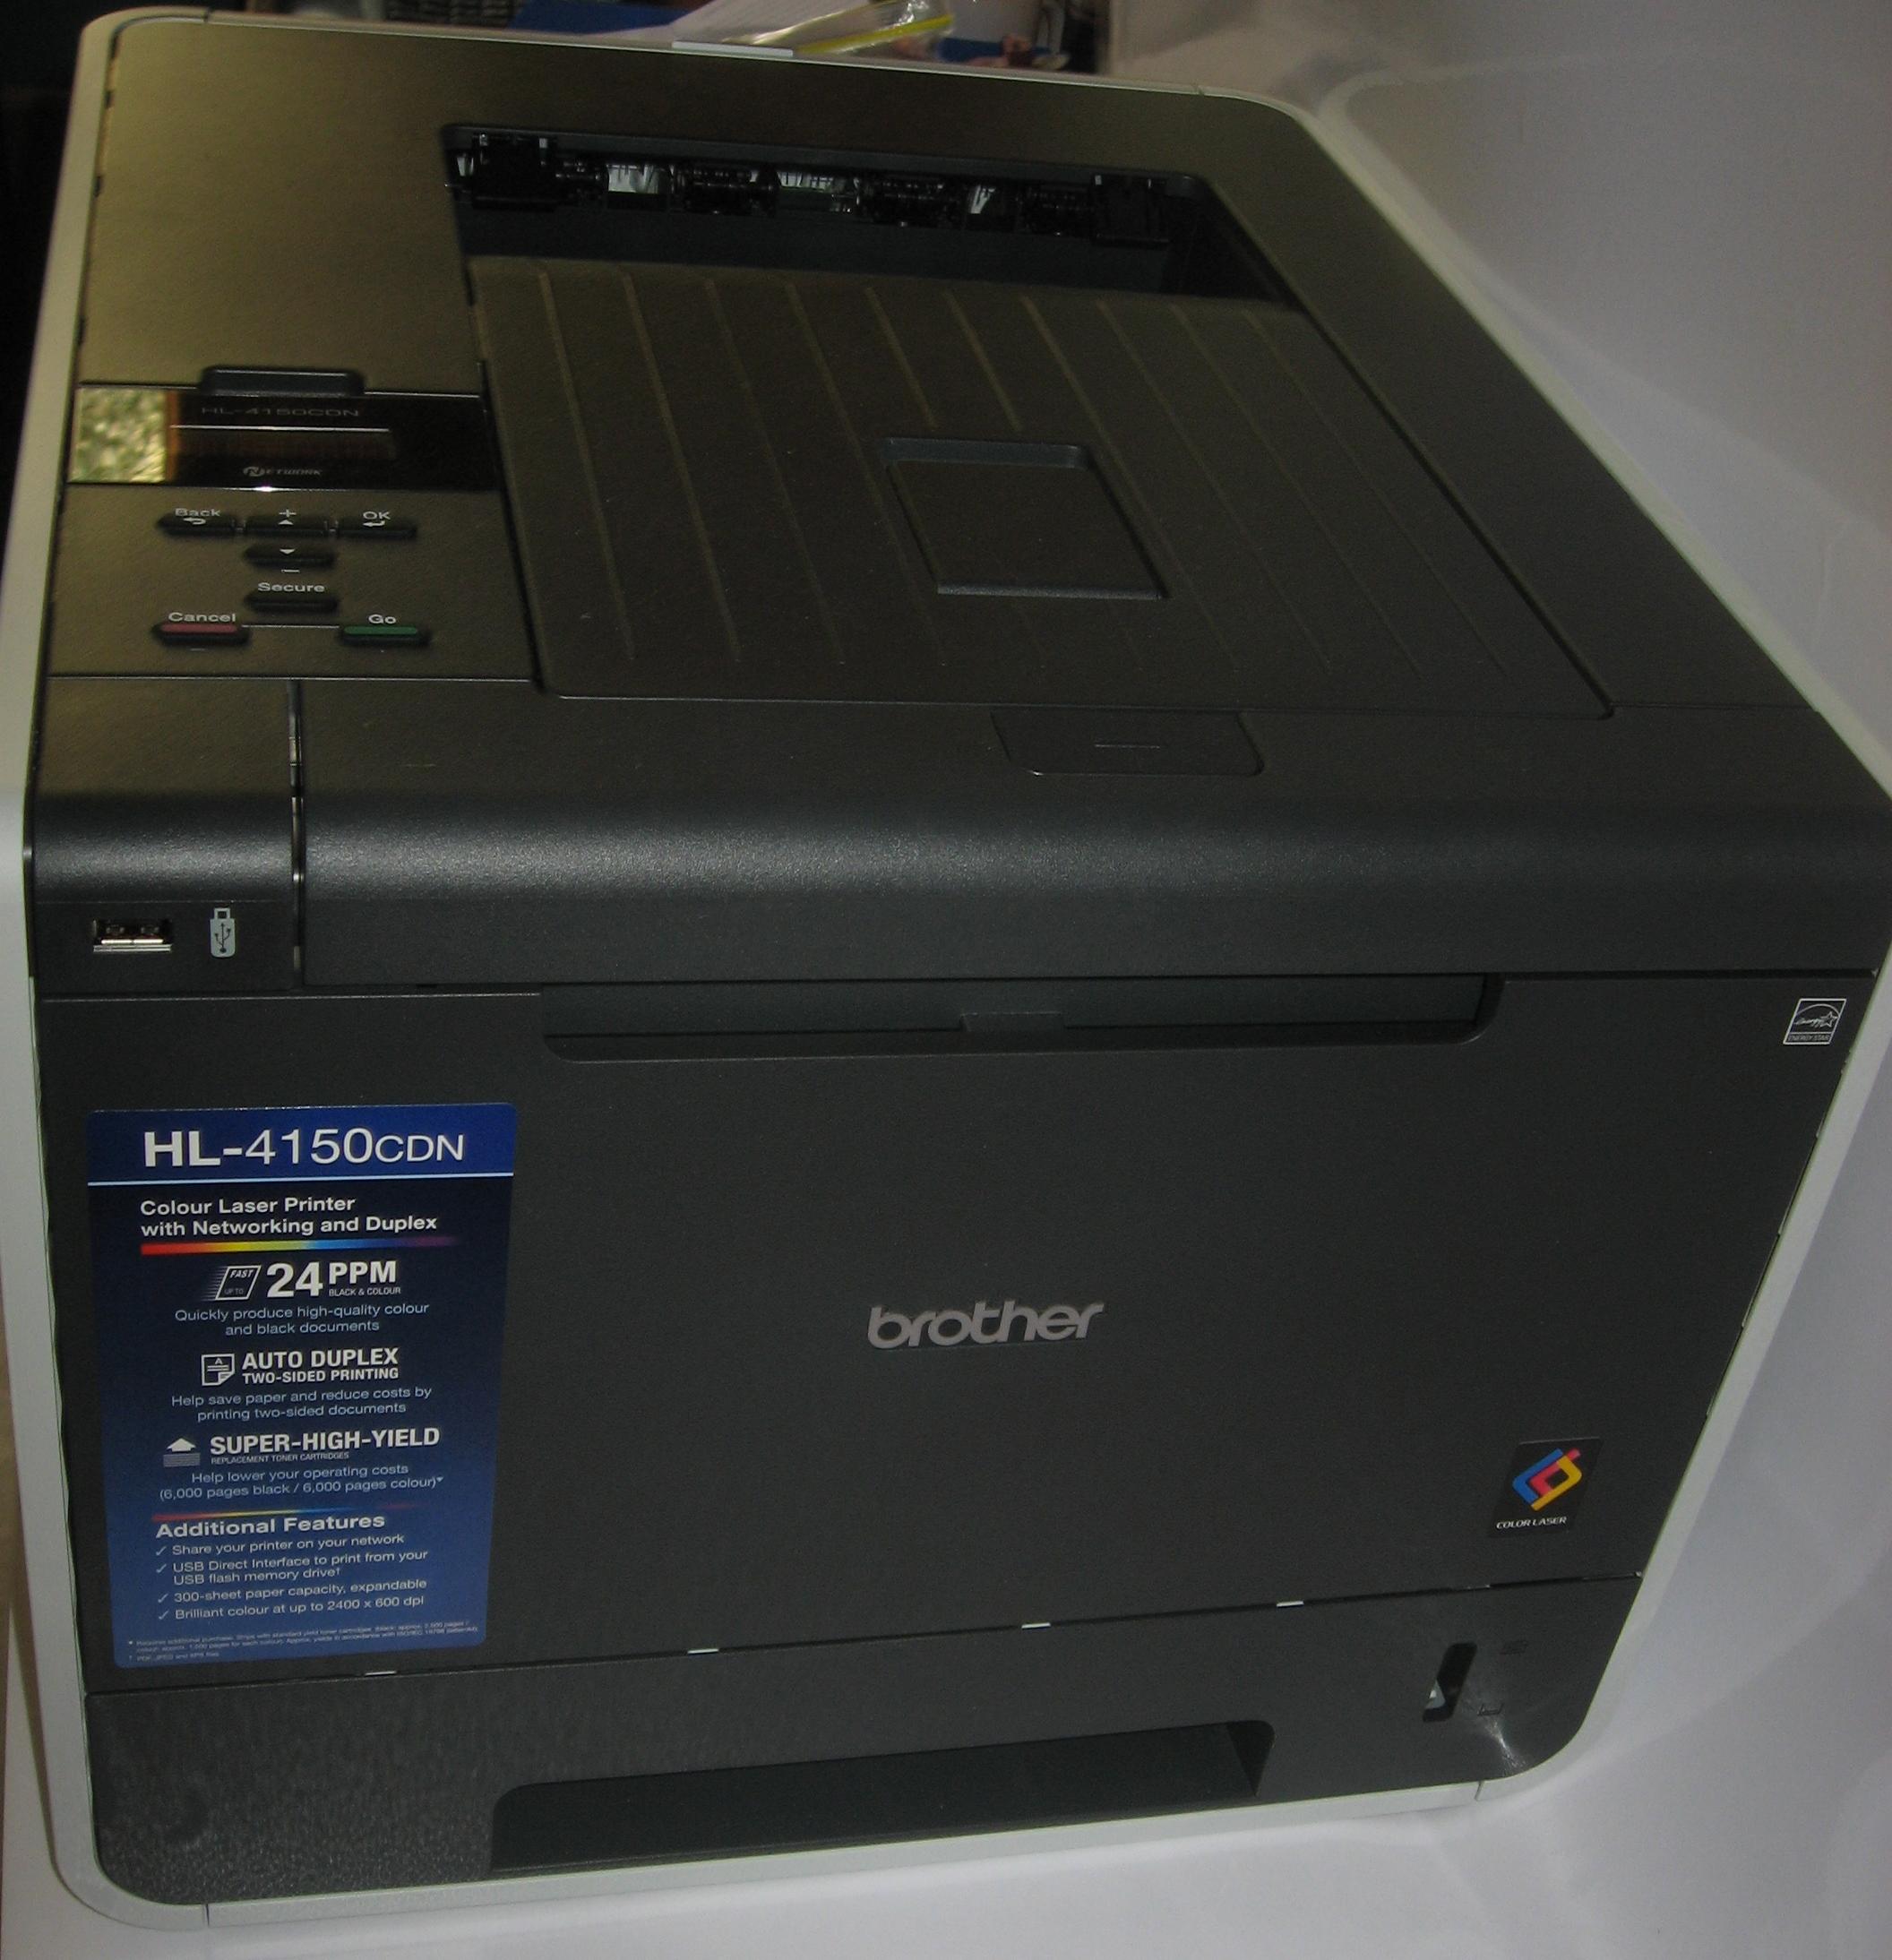 Brother HL-4150CDN Driver Software Download